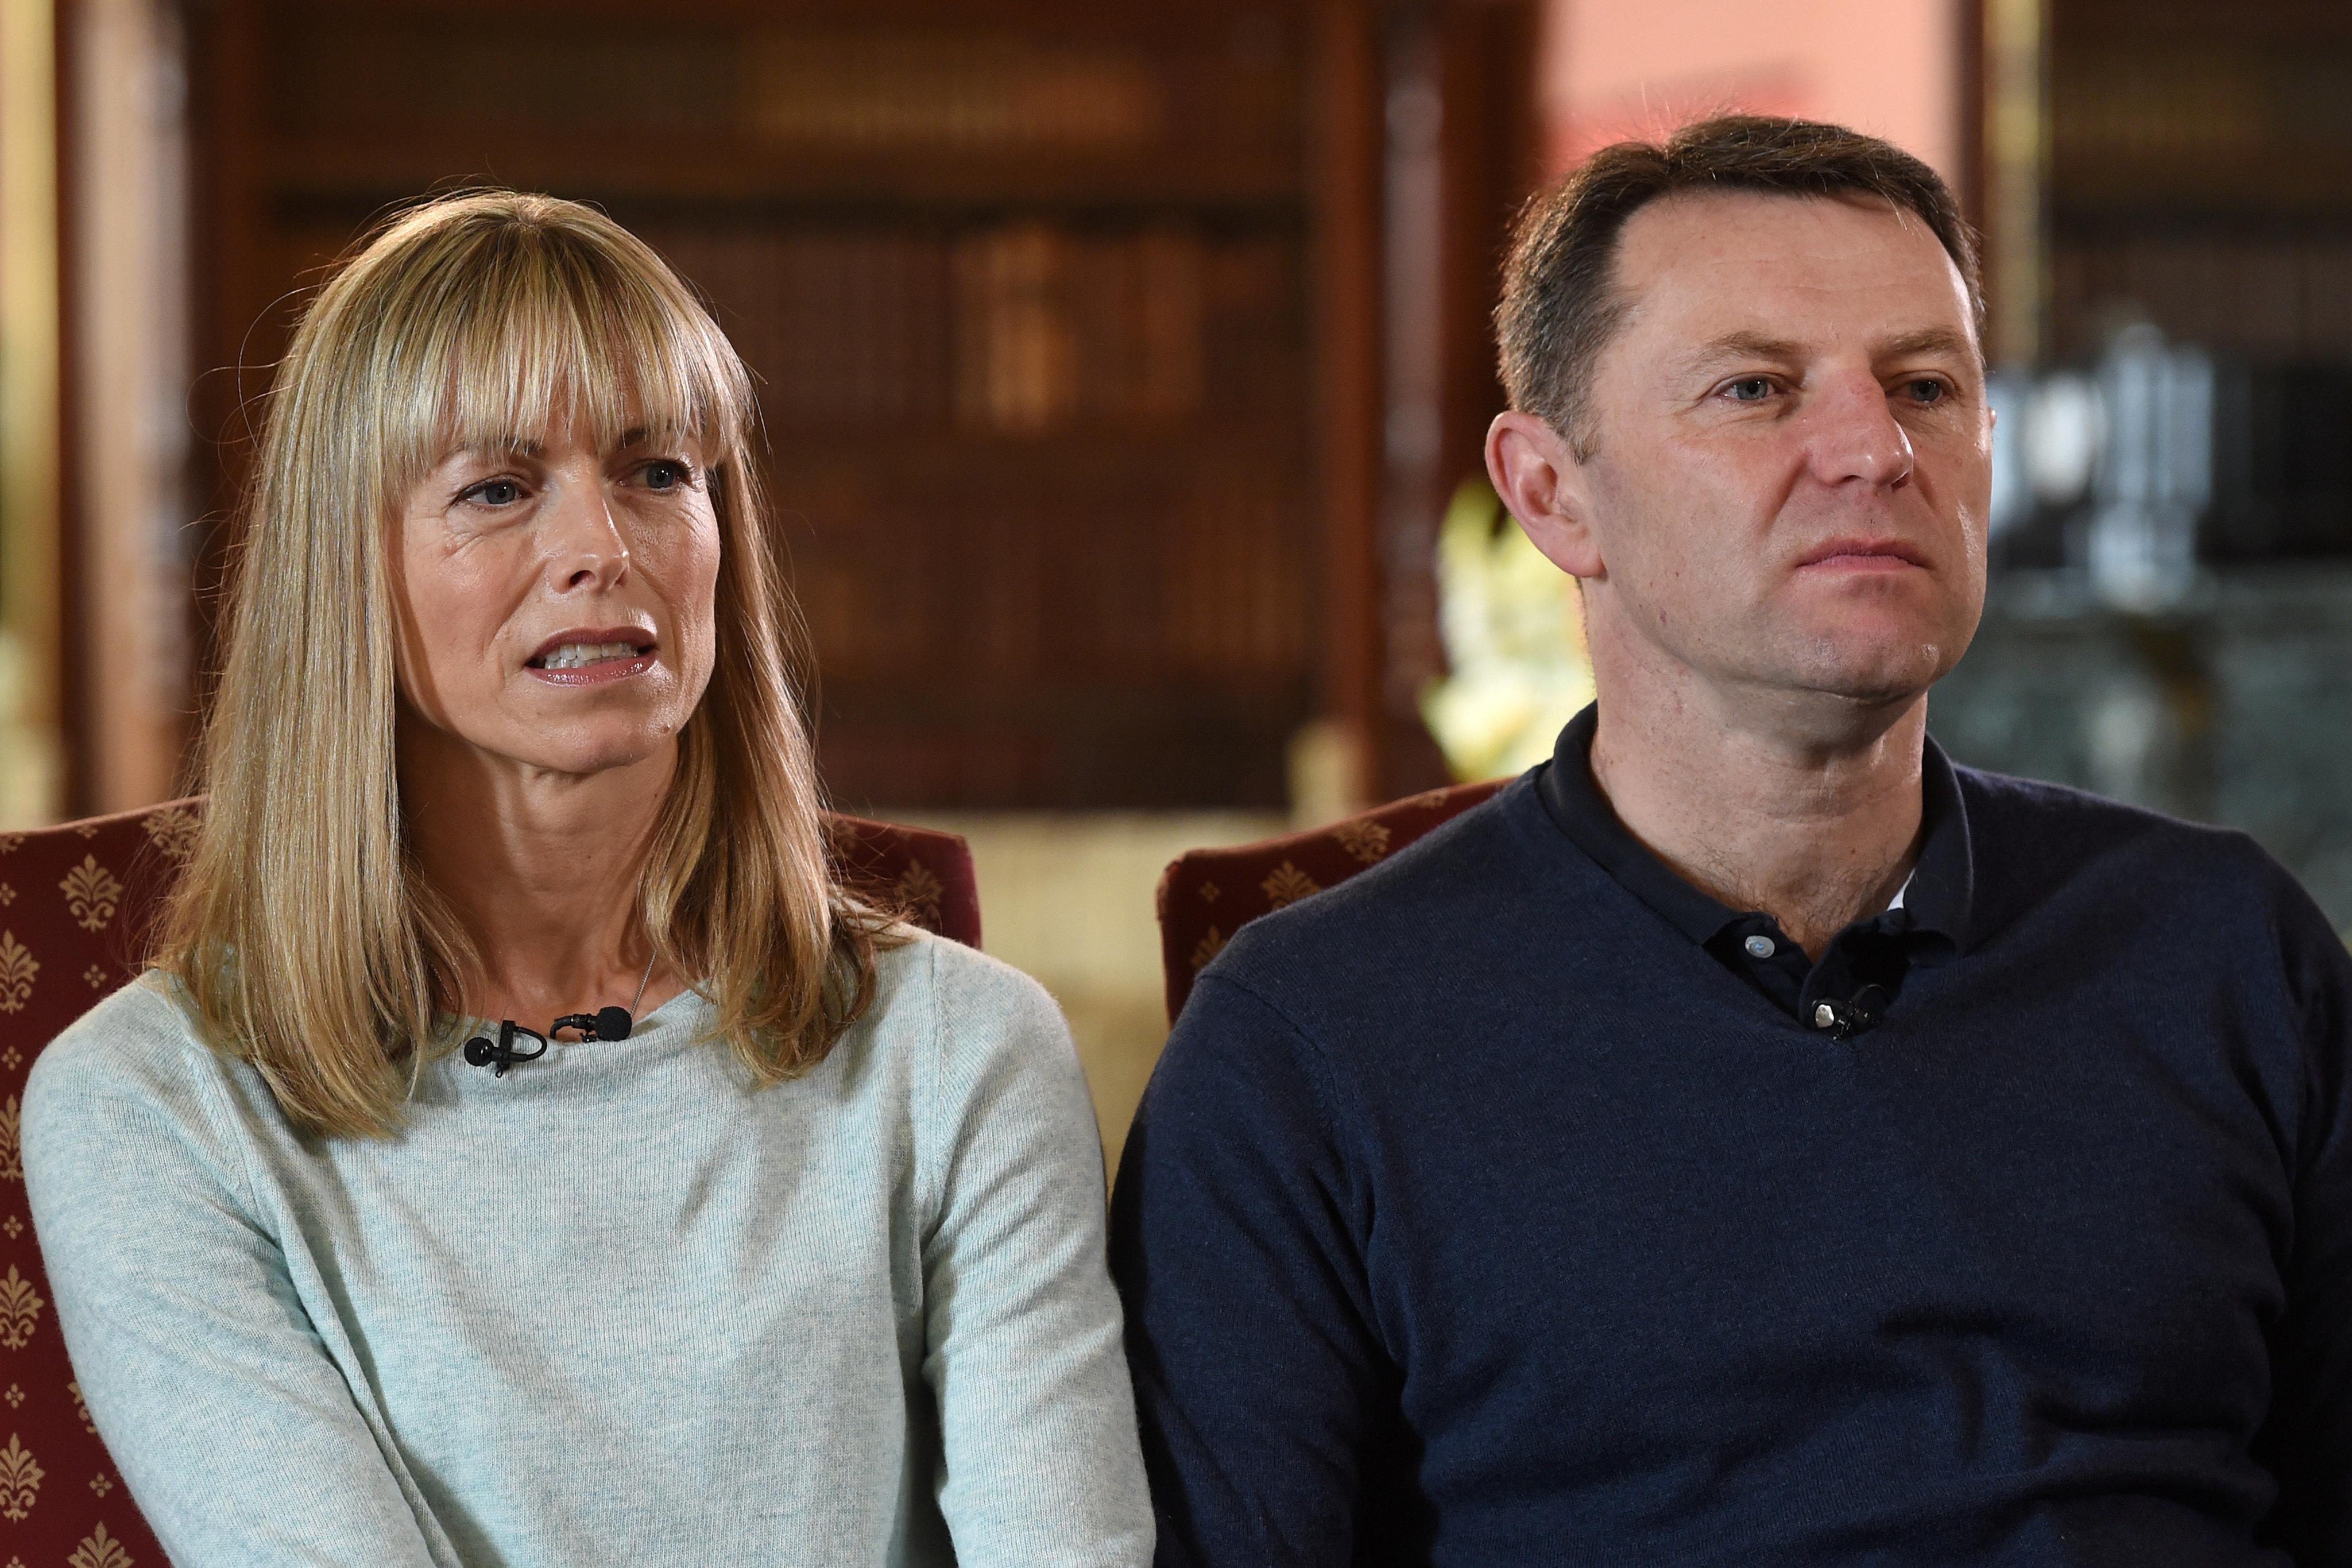 Madeleine McCann investigation given £154k to continue